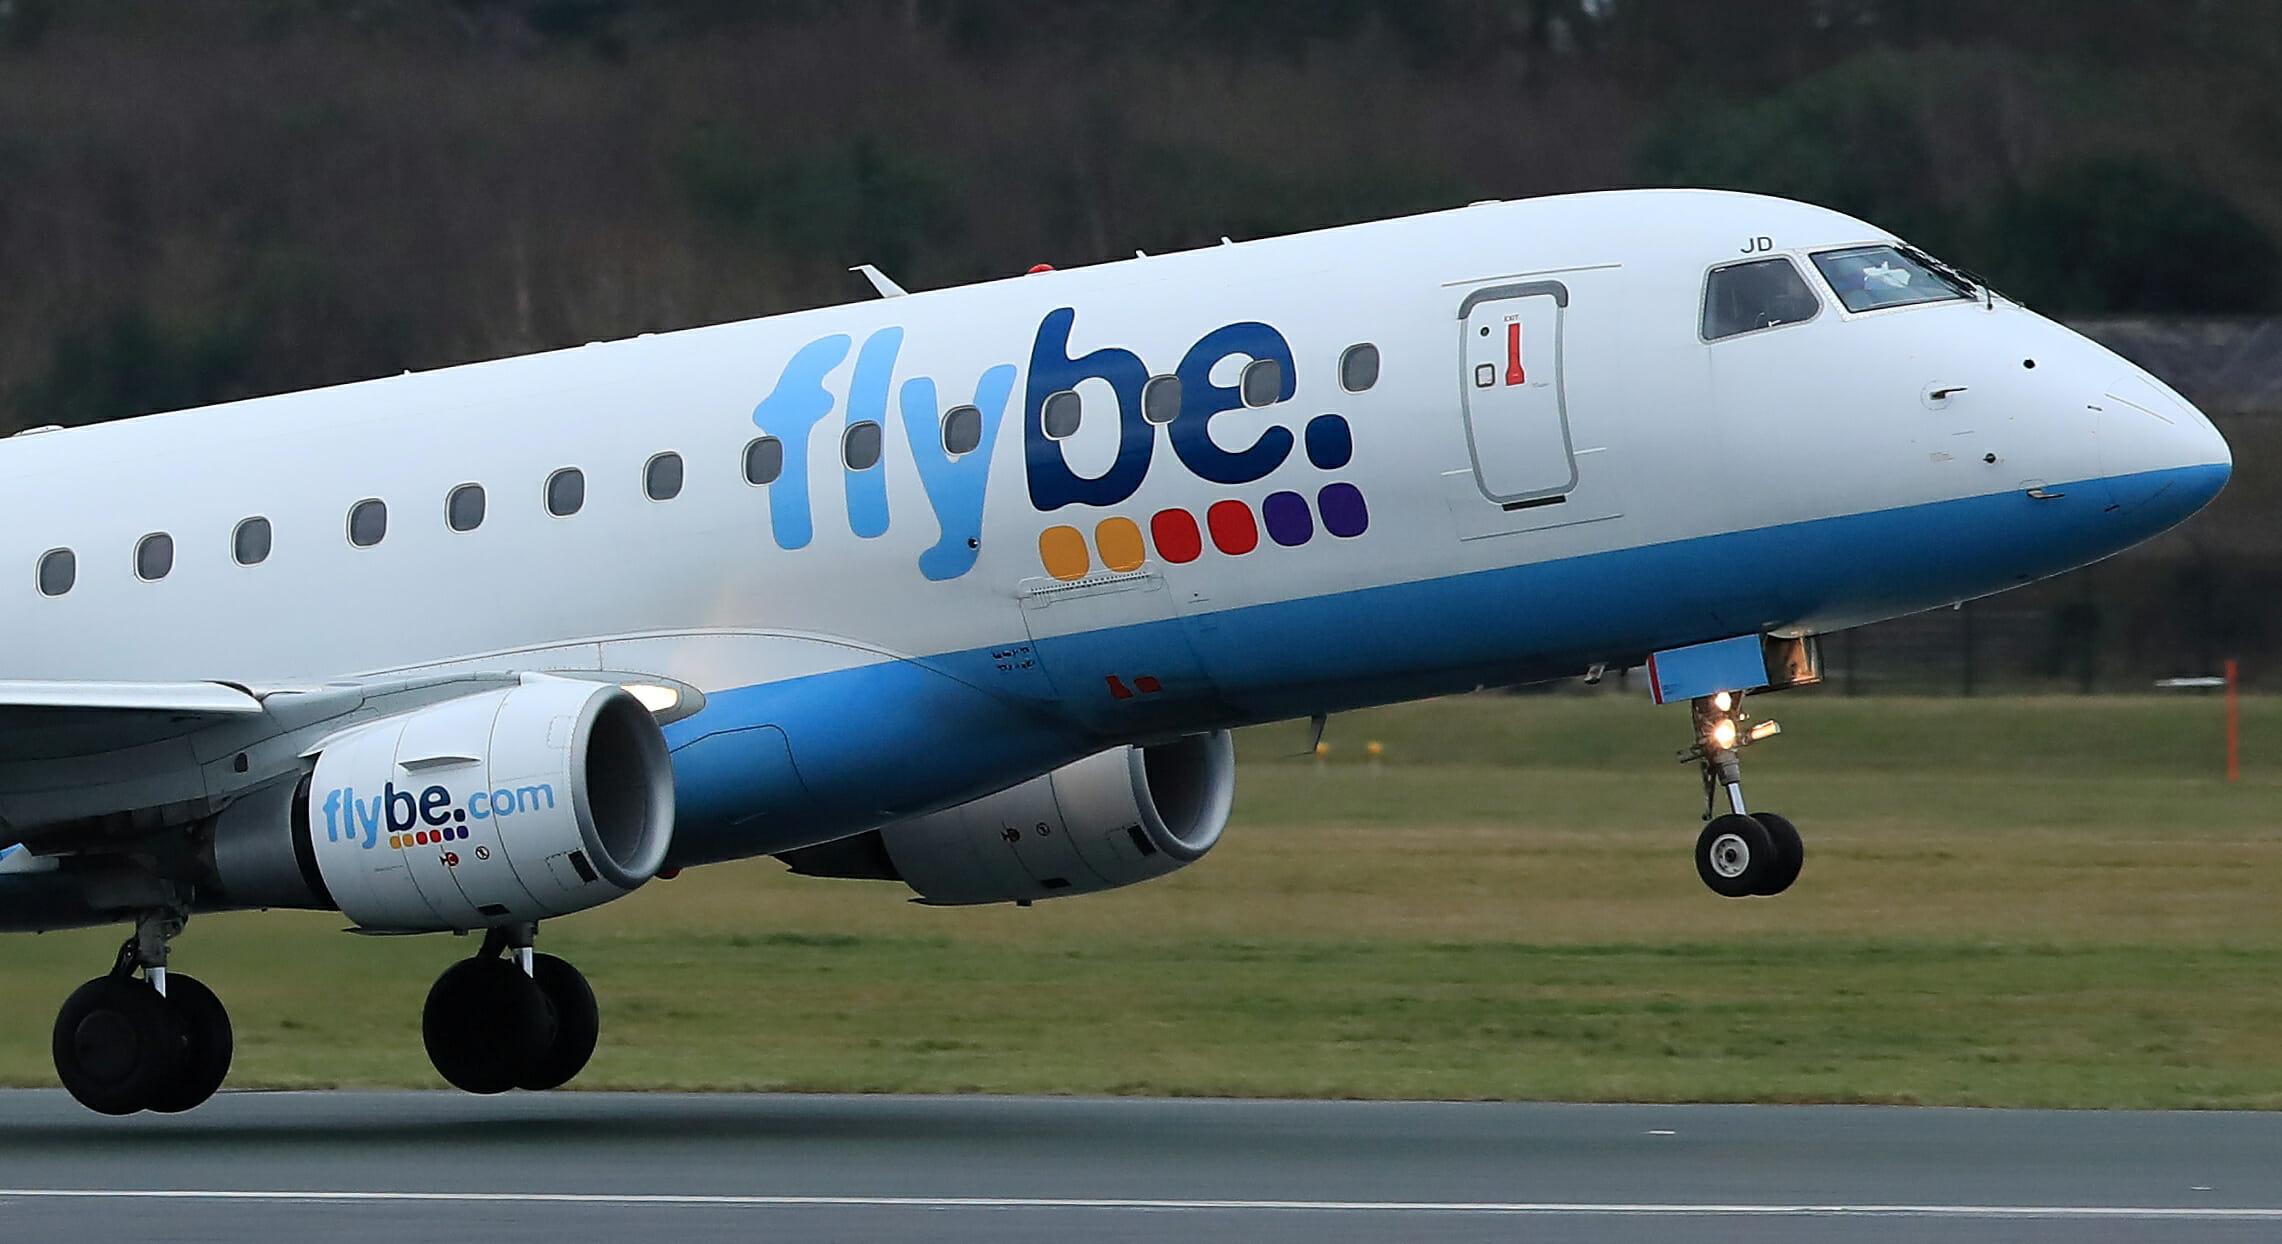 Flybe: Η πρώτη αεροπορική εταιρεία που σκότωσε ο κορονοϊός;